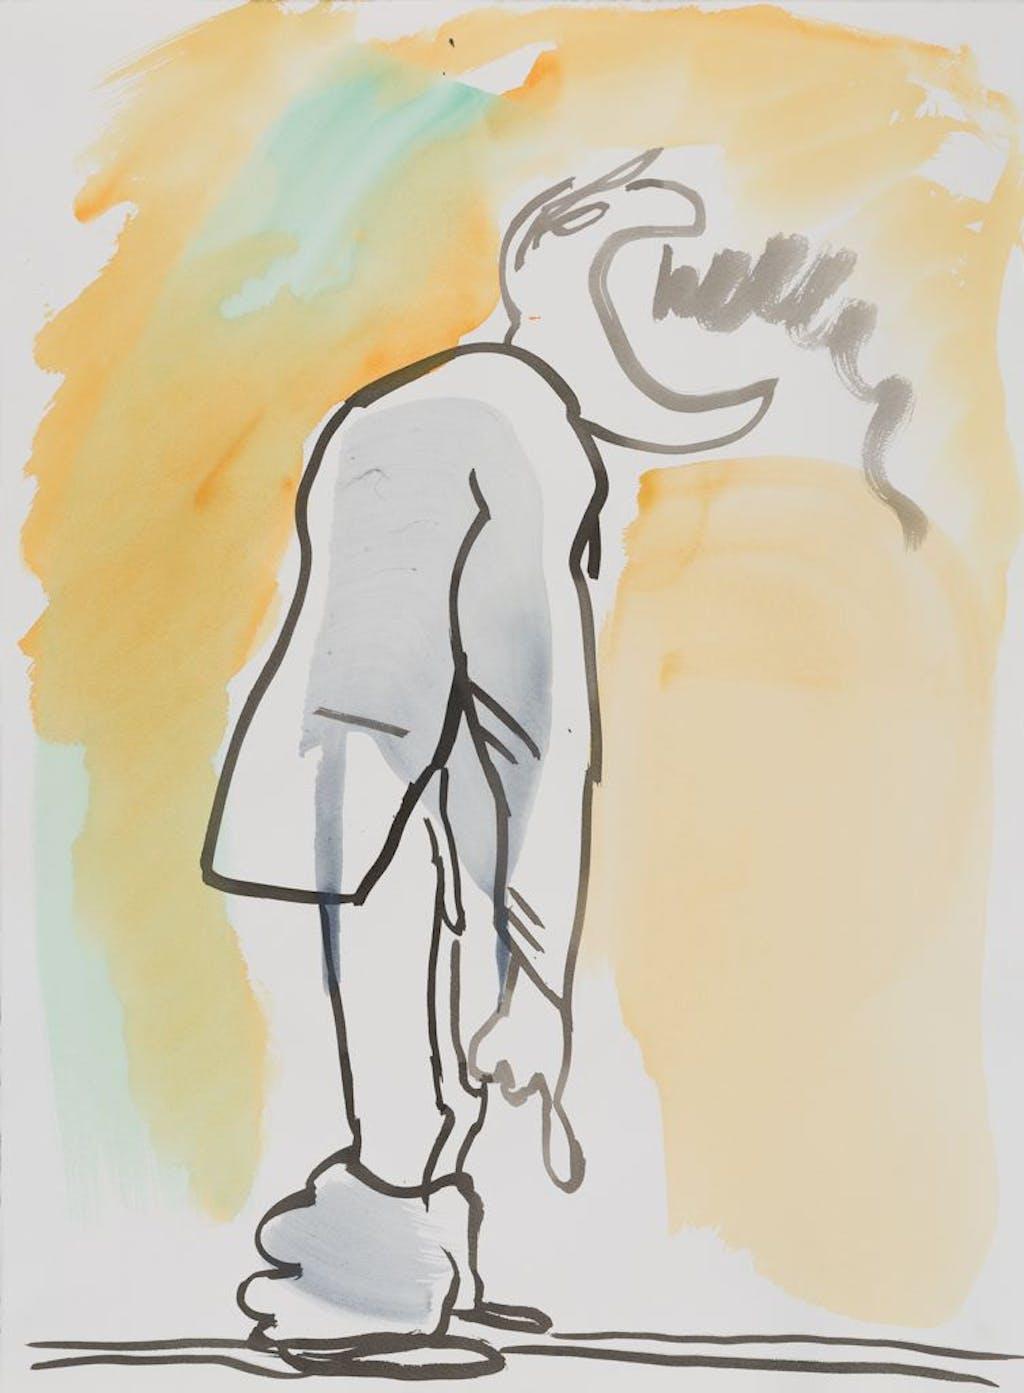 The Narcissist - © kamel mennour